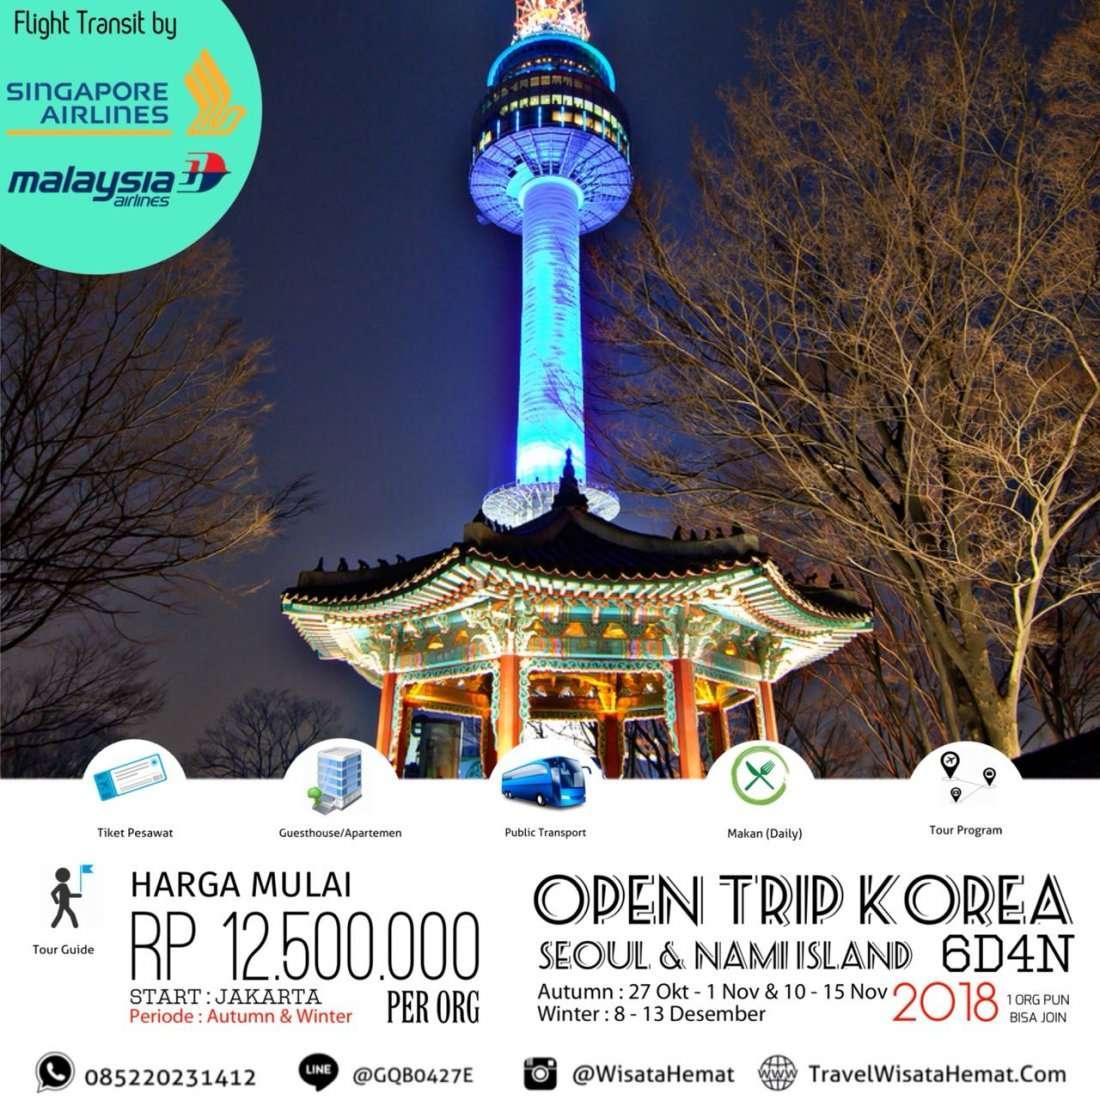 OPEN TRIP KOREA (SEOUL & NAMI ISLAND) 27 OKT-1 NOV 2018